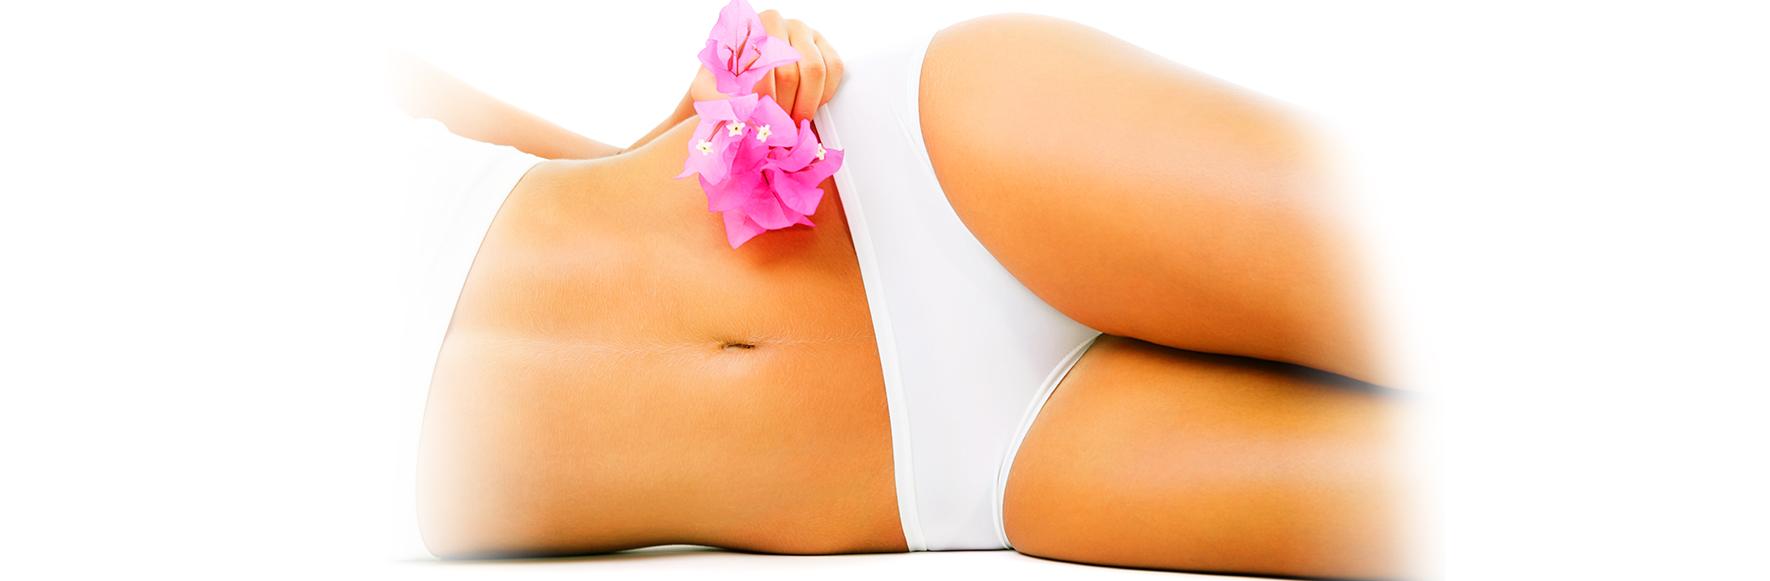 slider-bikini-flower